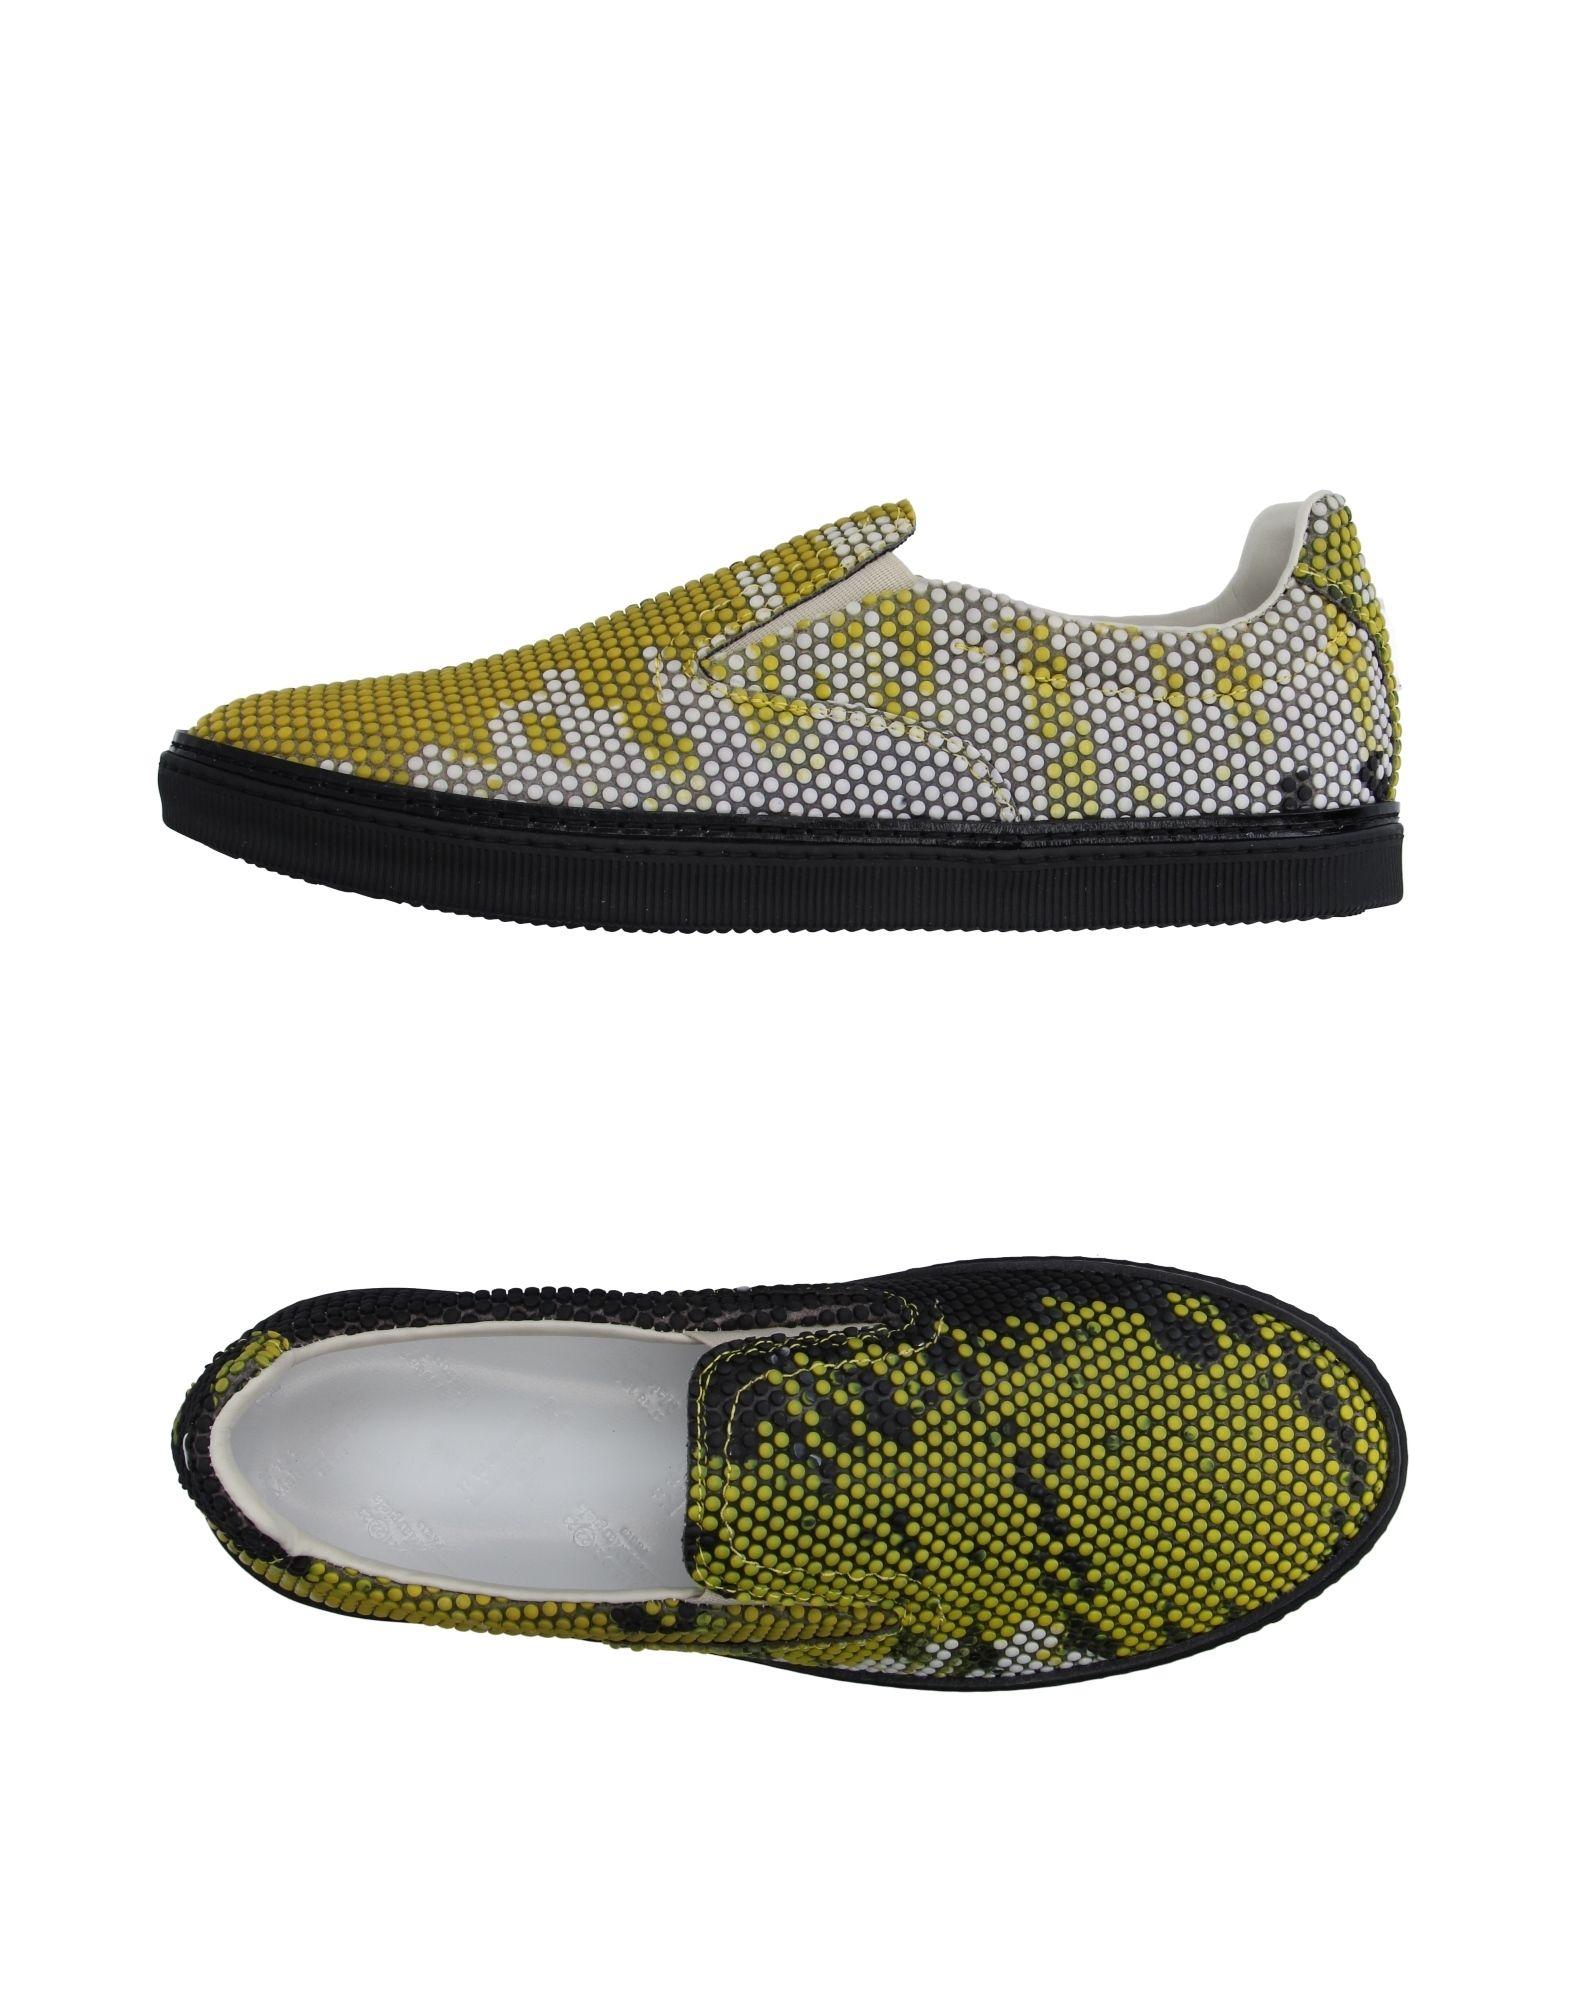 Maison Margiela Gute Sneakers Herren  11114978KD Gute Margiela Qualität beliebte Schuhe 3dffa2